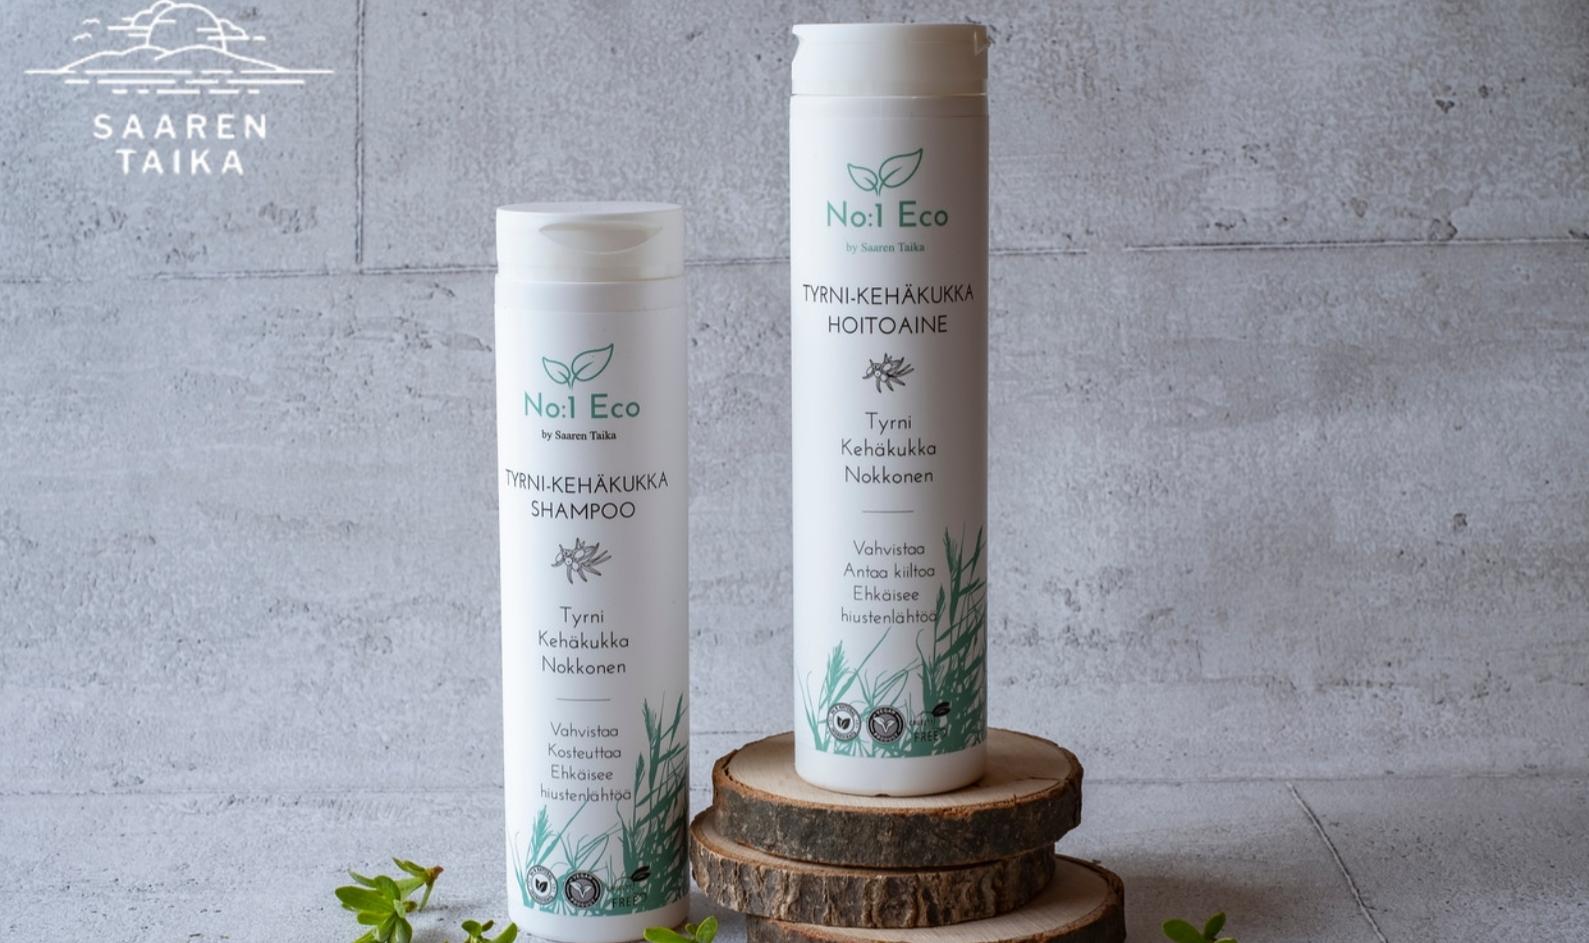 NO:1 Eco® Tyrni-kehäkukka Shampoo